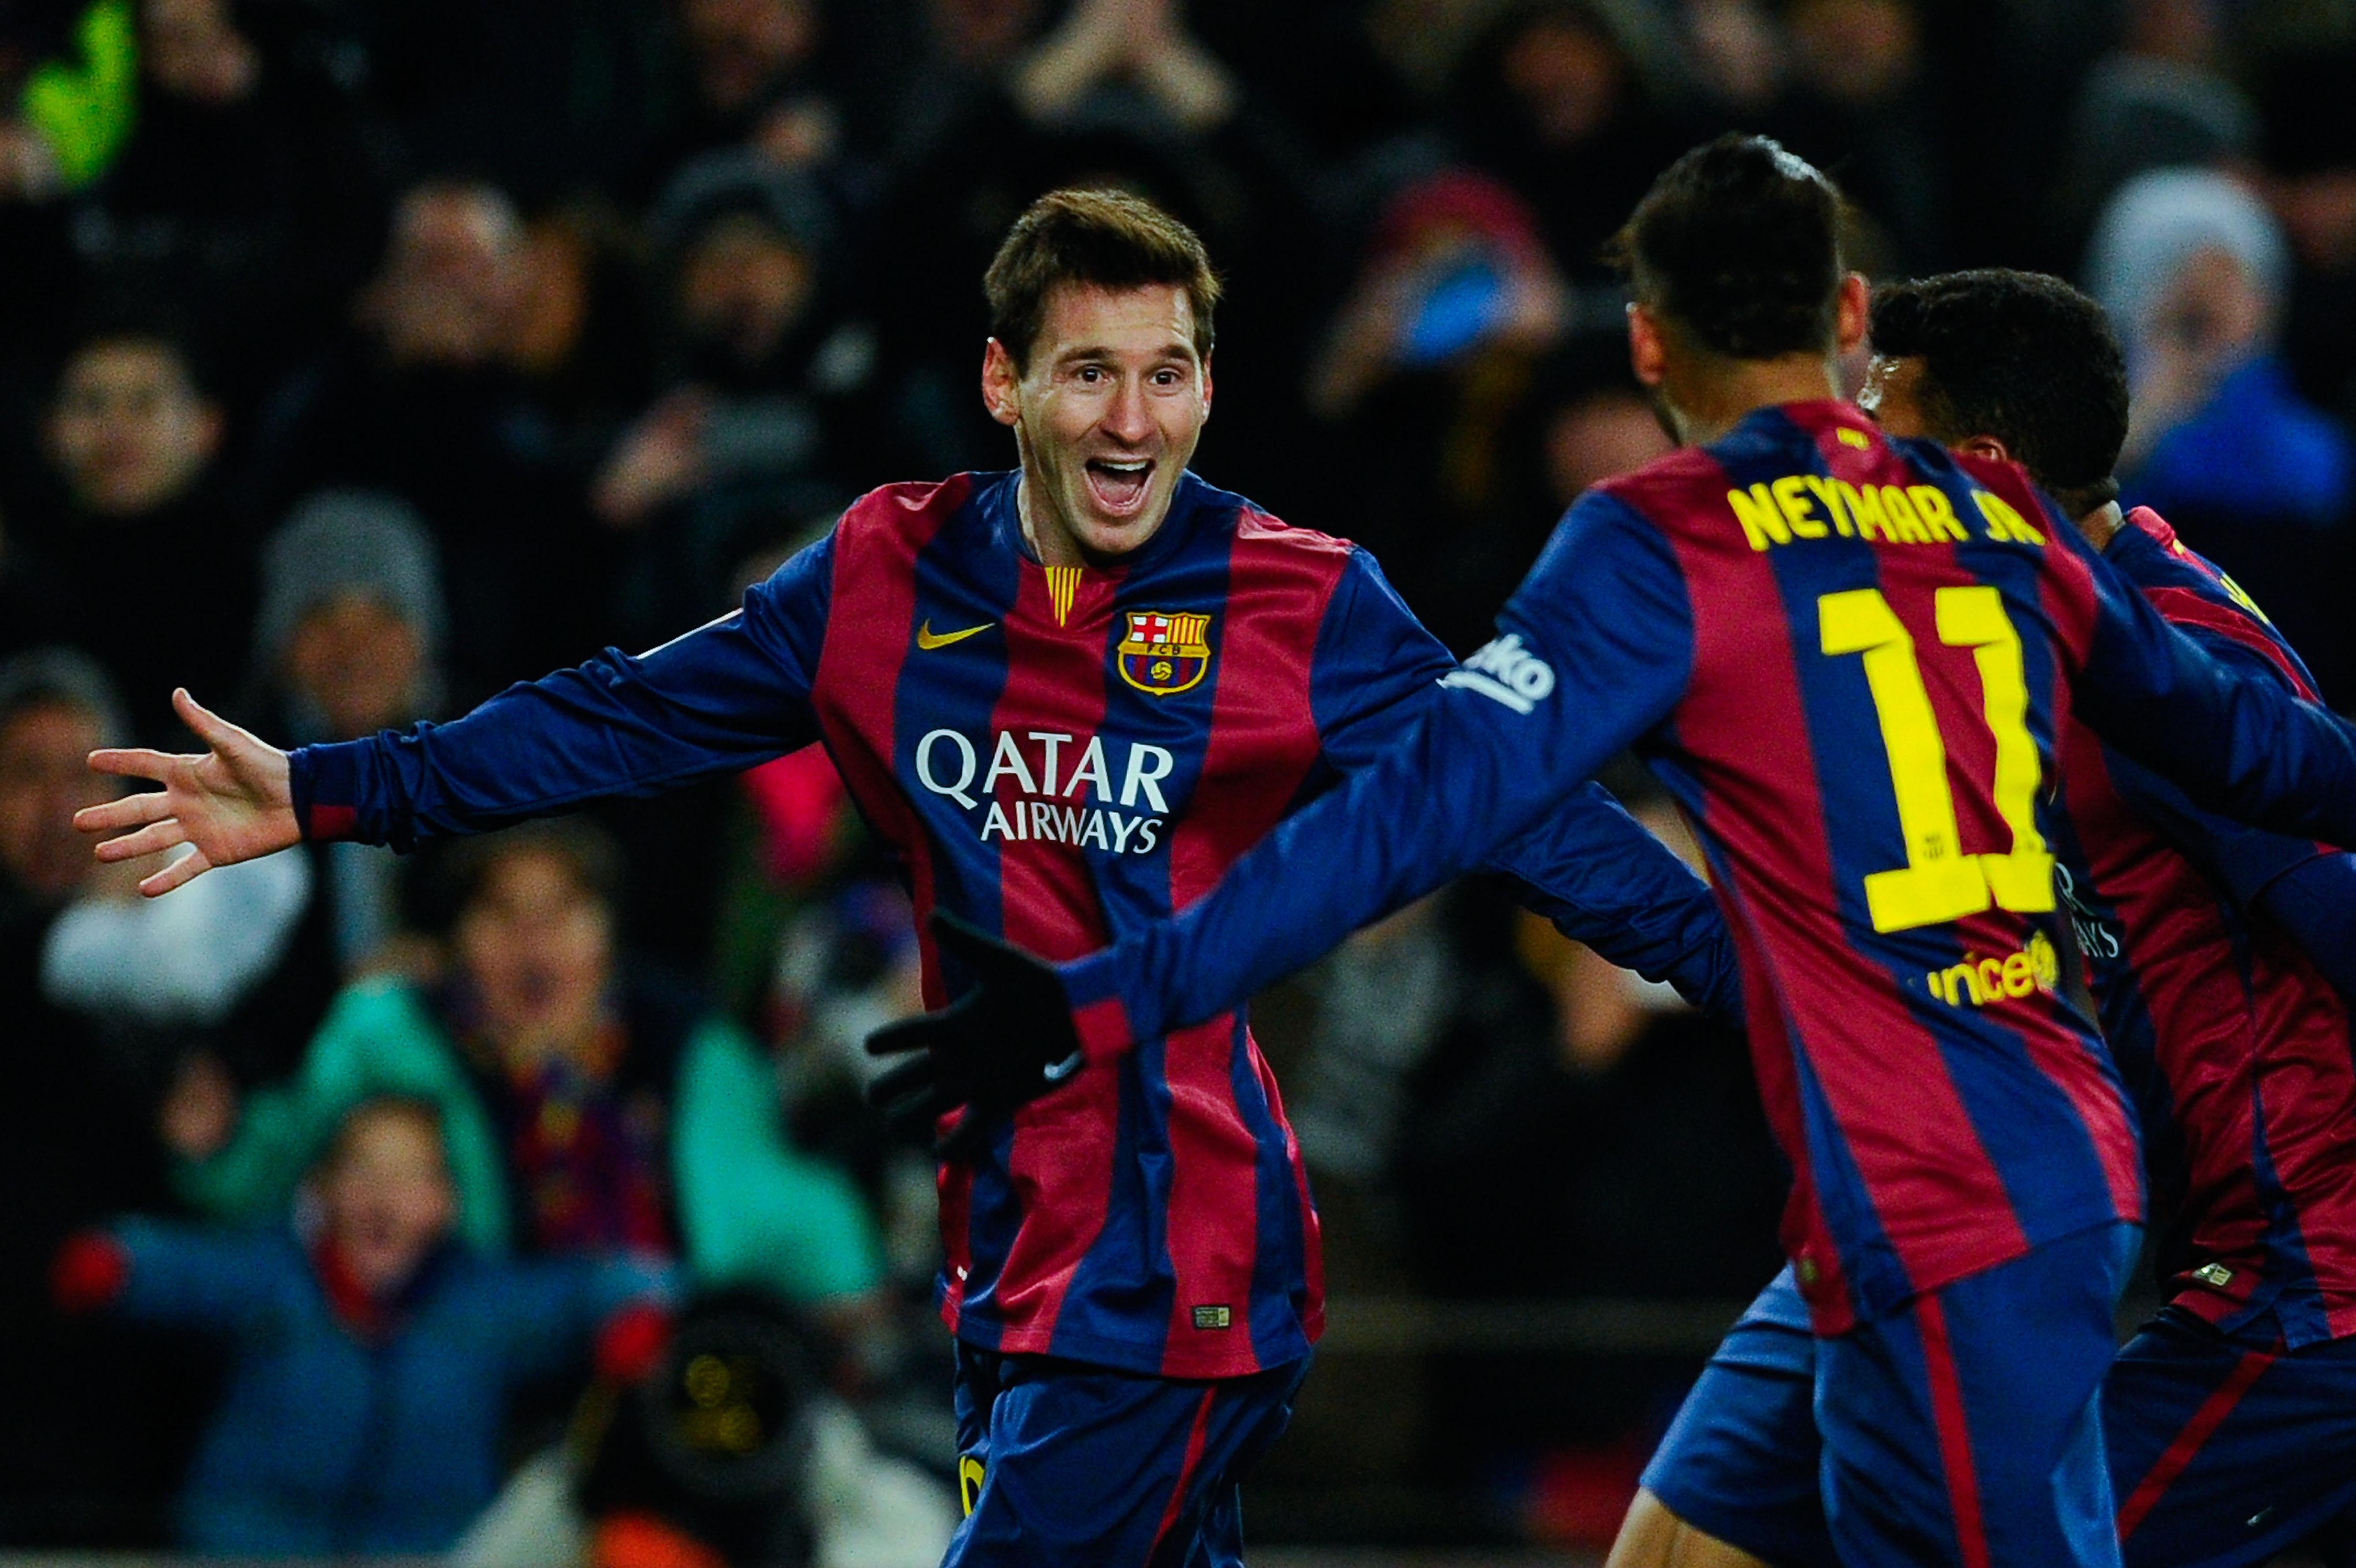 Прогноз на матч Барселона - Вильярреал 02 декабря 2018